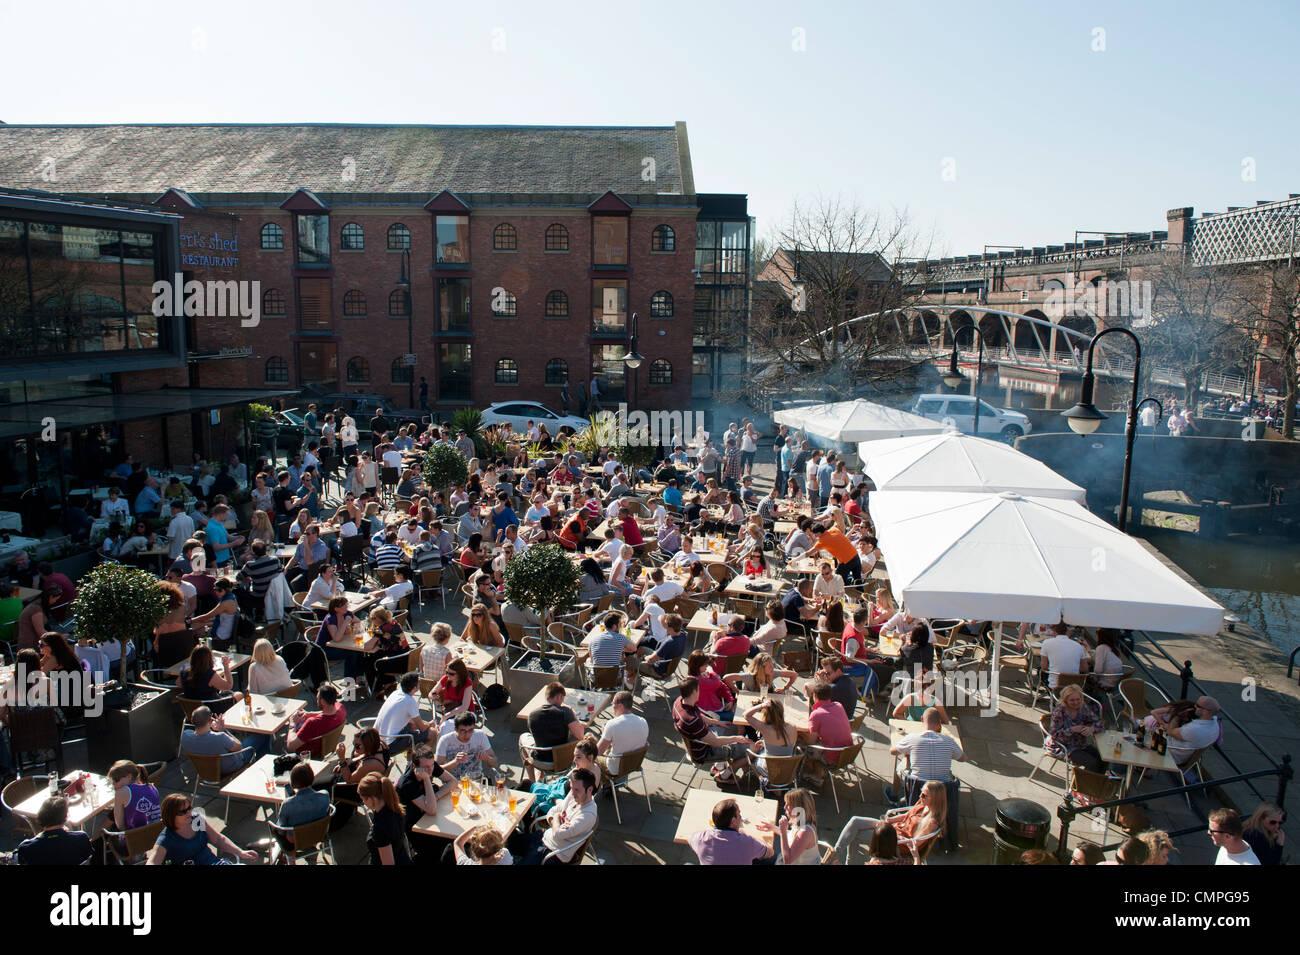 revellers-enjoy-the-evening-sunshine-in-